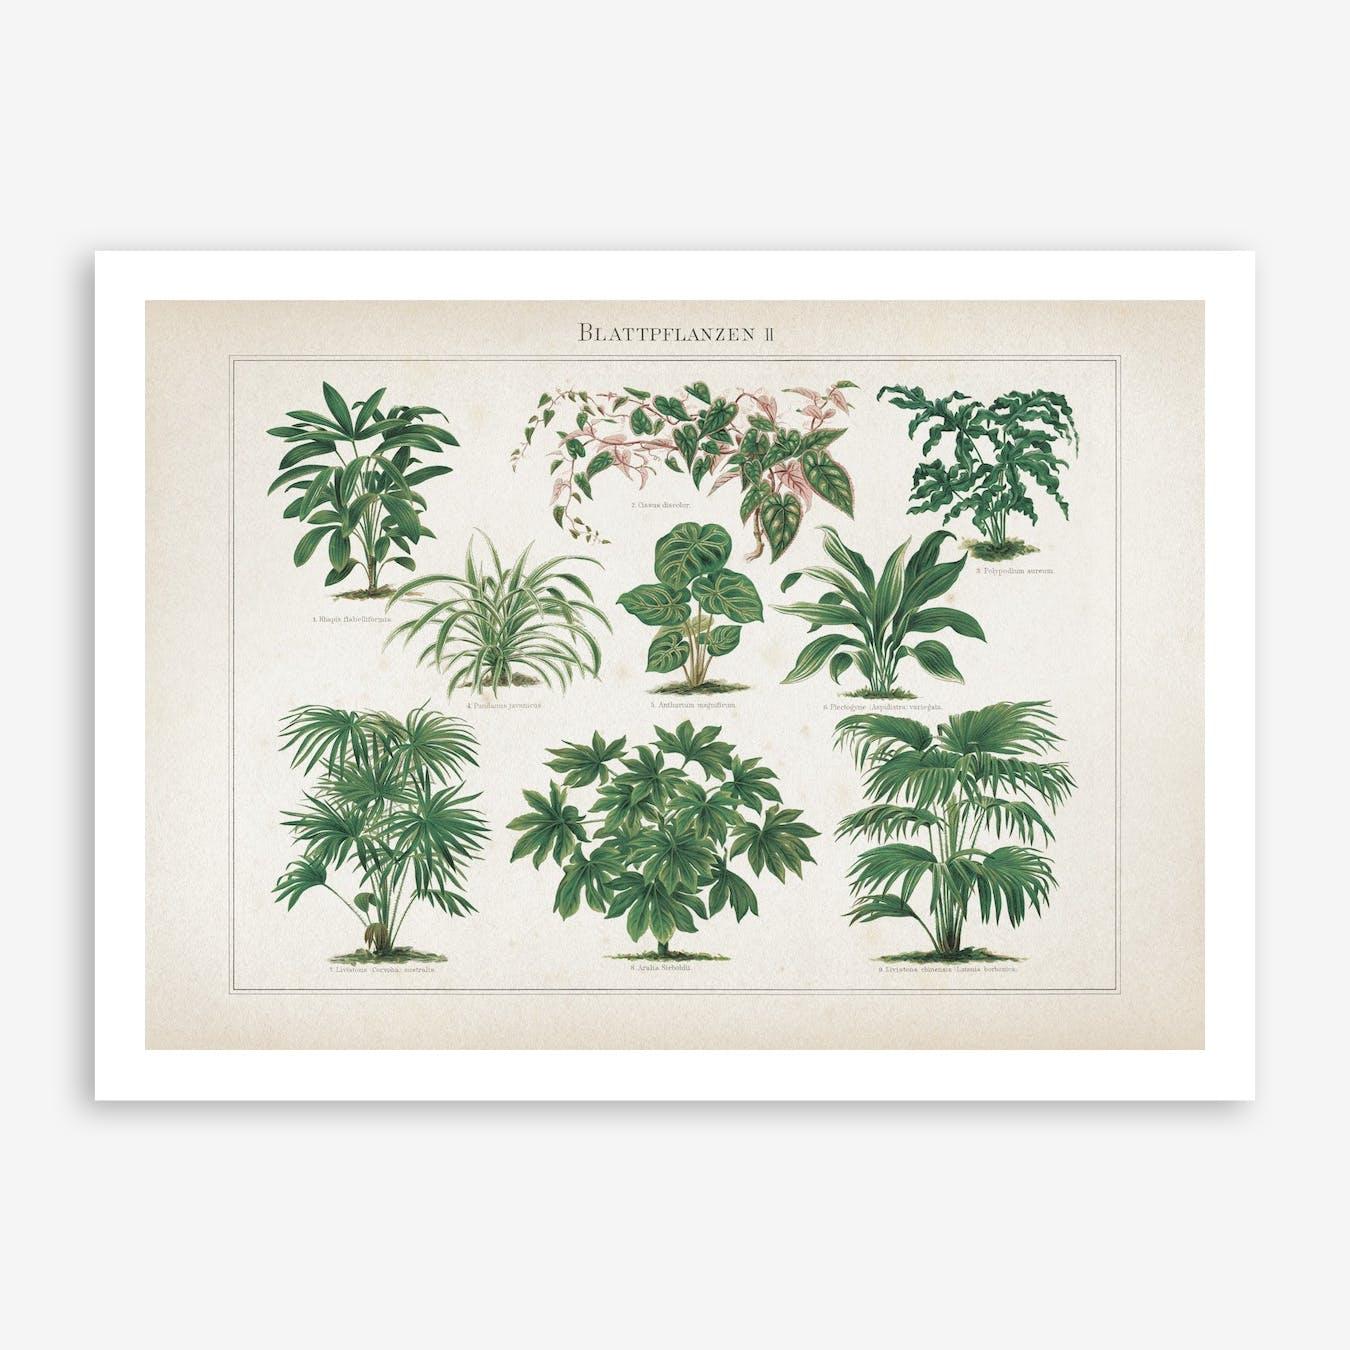 Vintage Meyers 1 Blattpflanzen 2